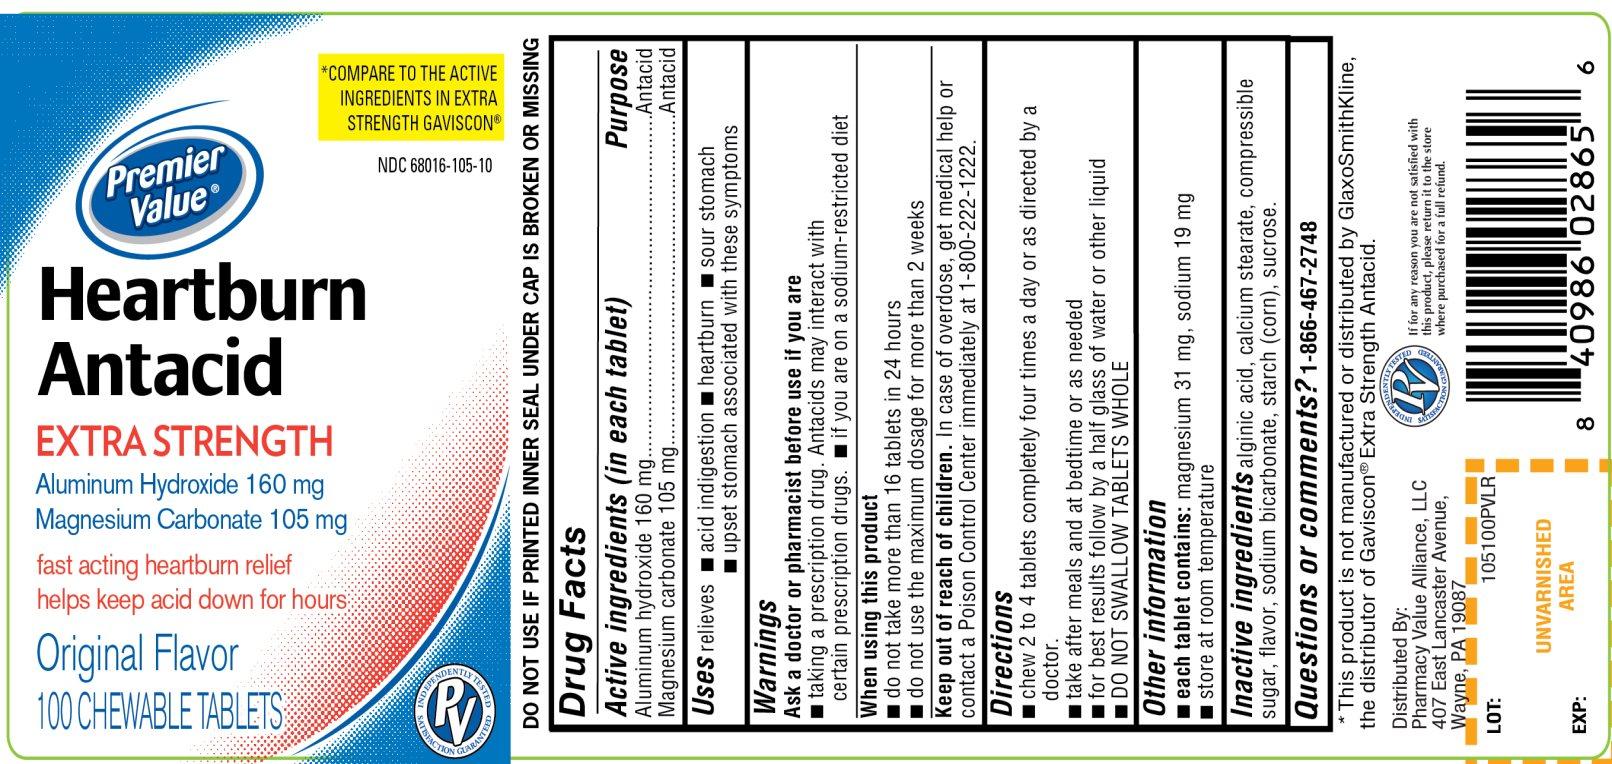 Heartburn Antacid Original Flavor 100 Chewable Tablets